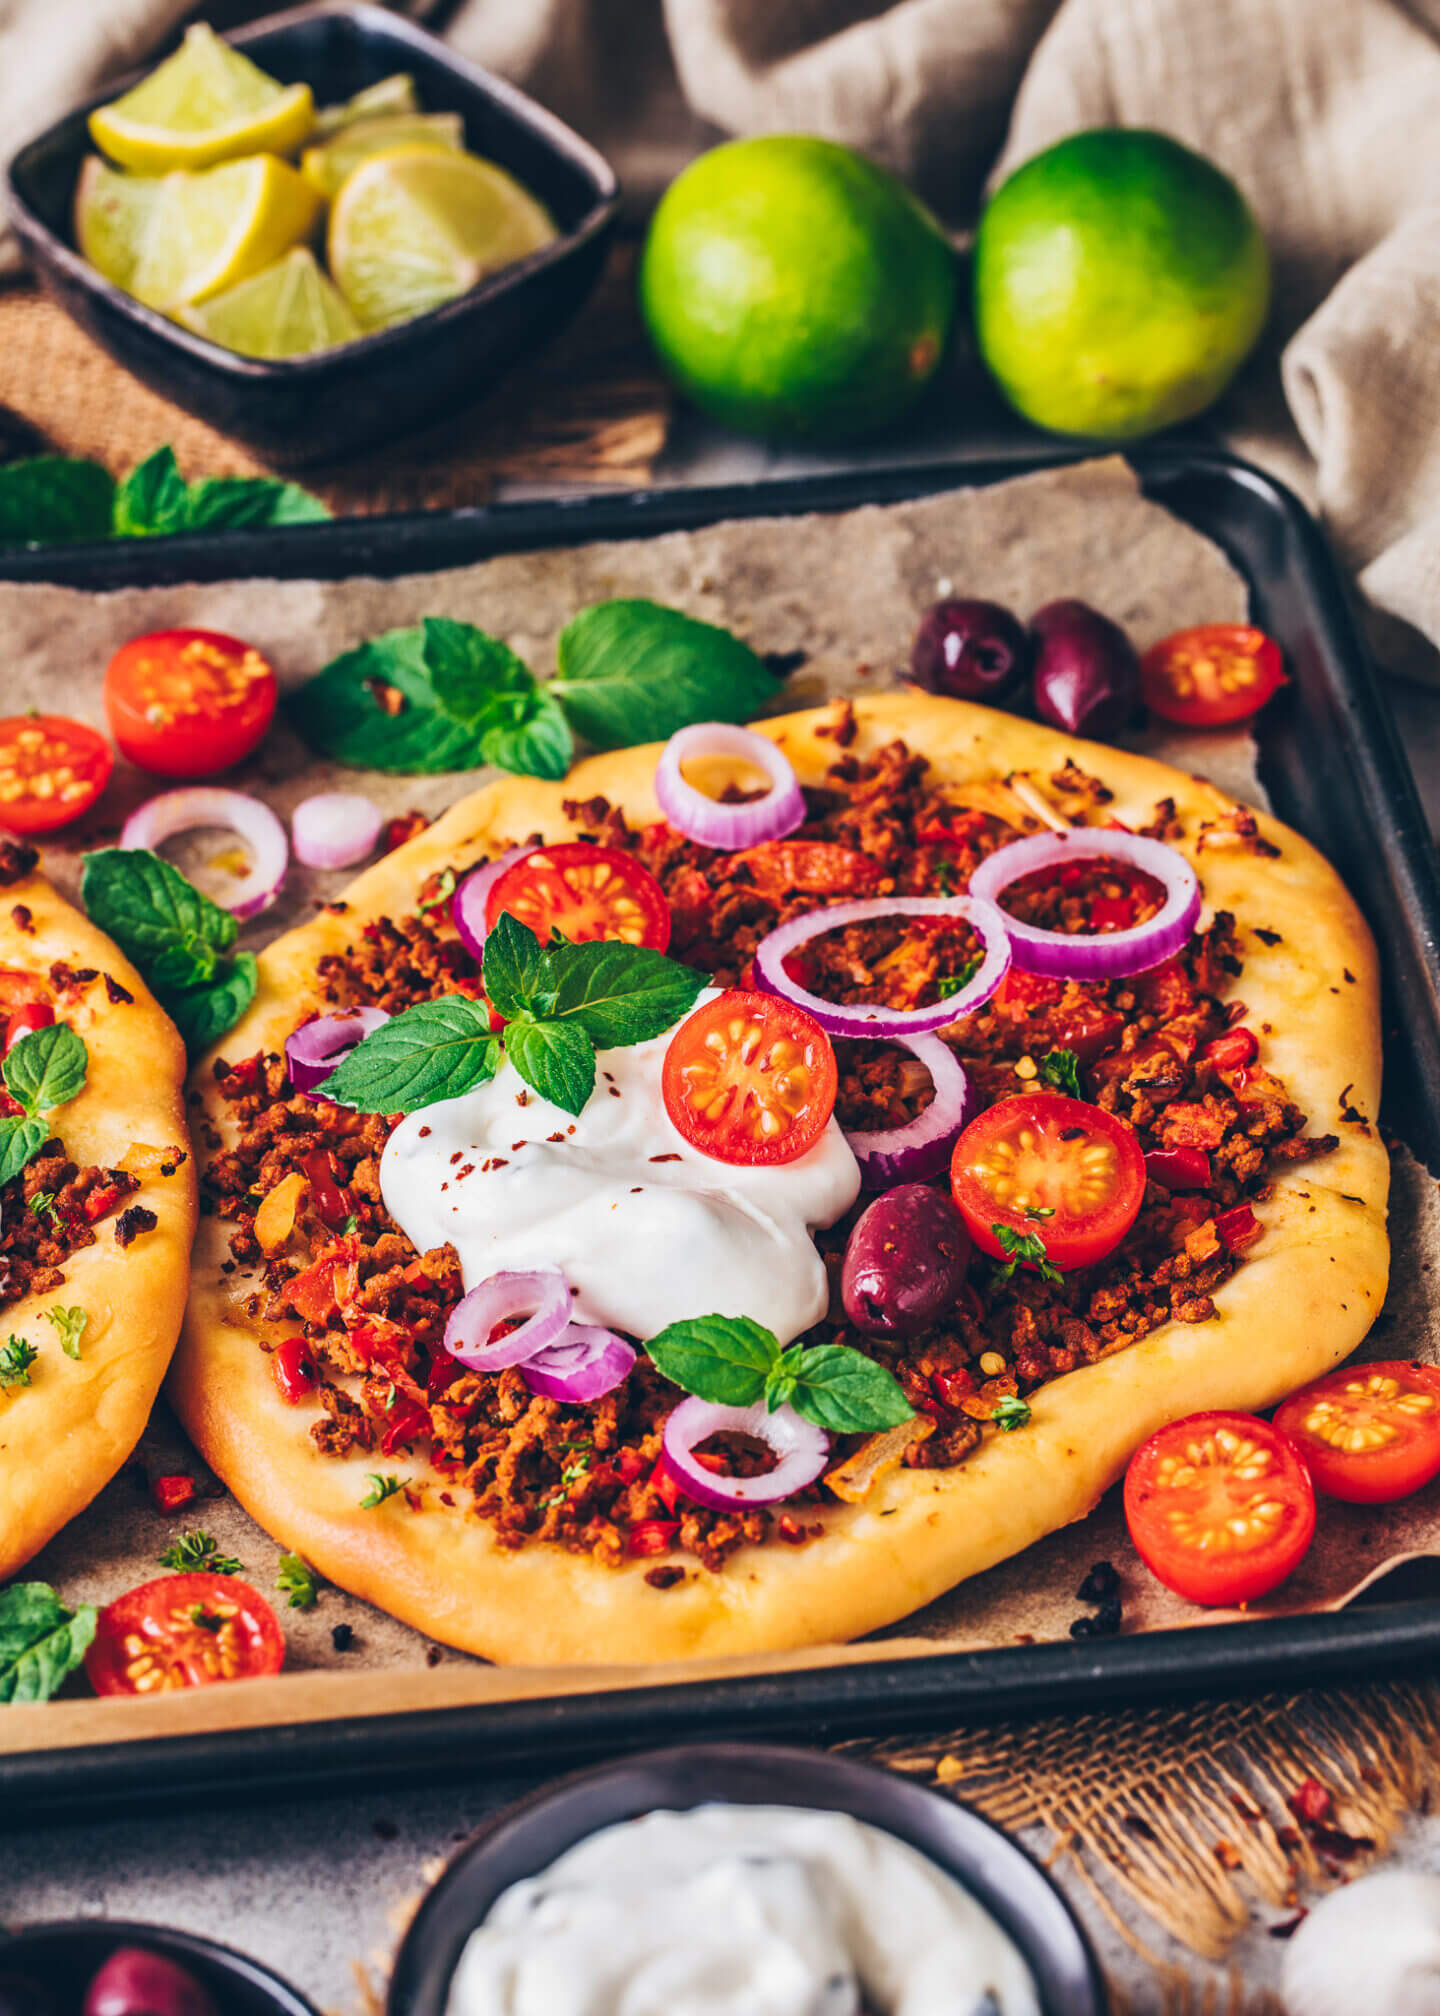 Turkish flatbread pizza